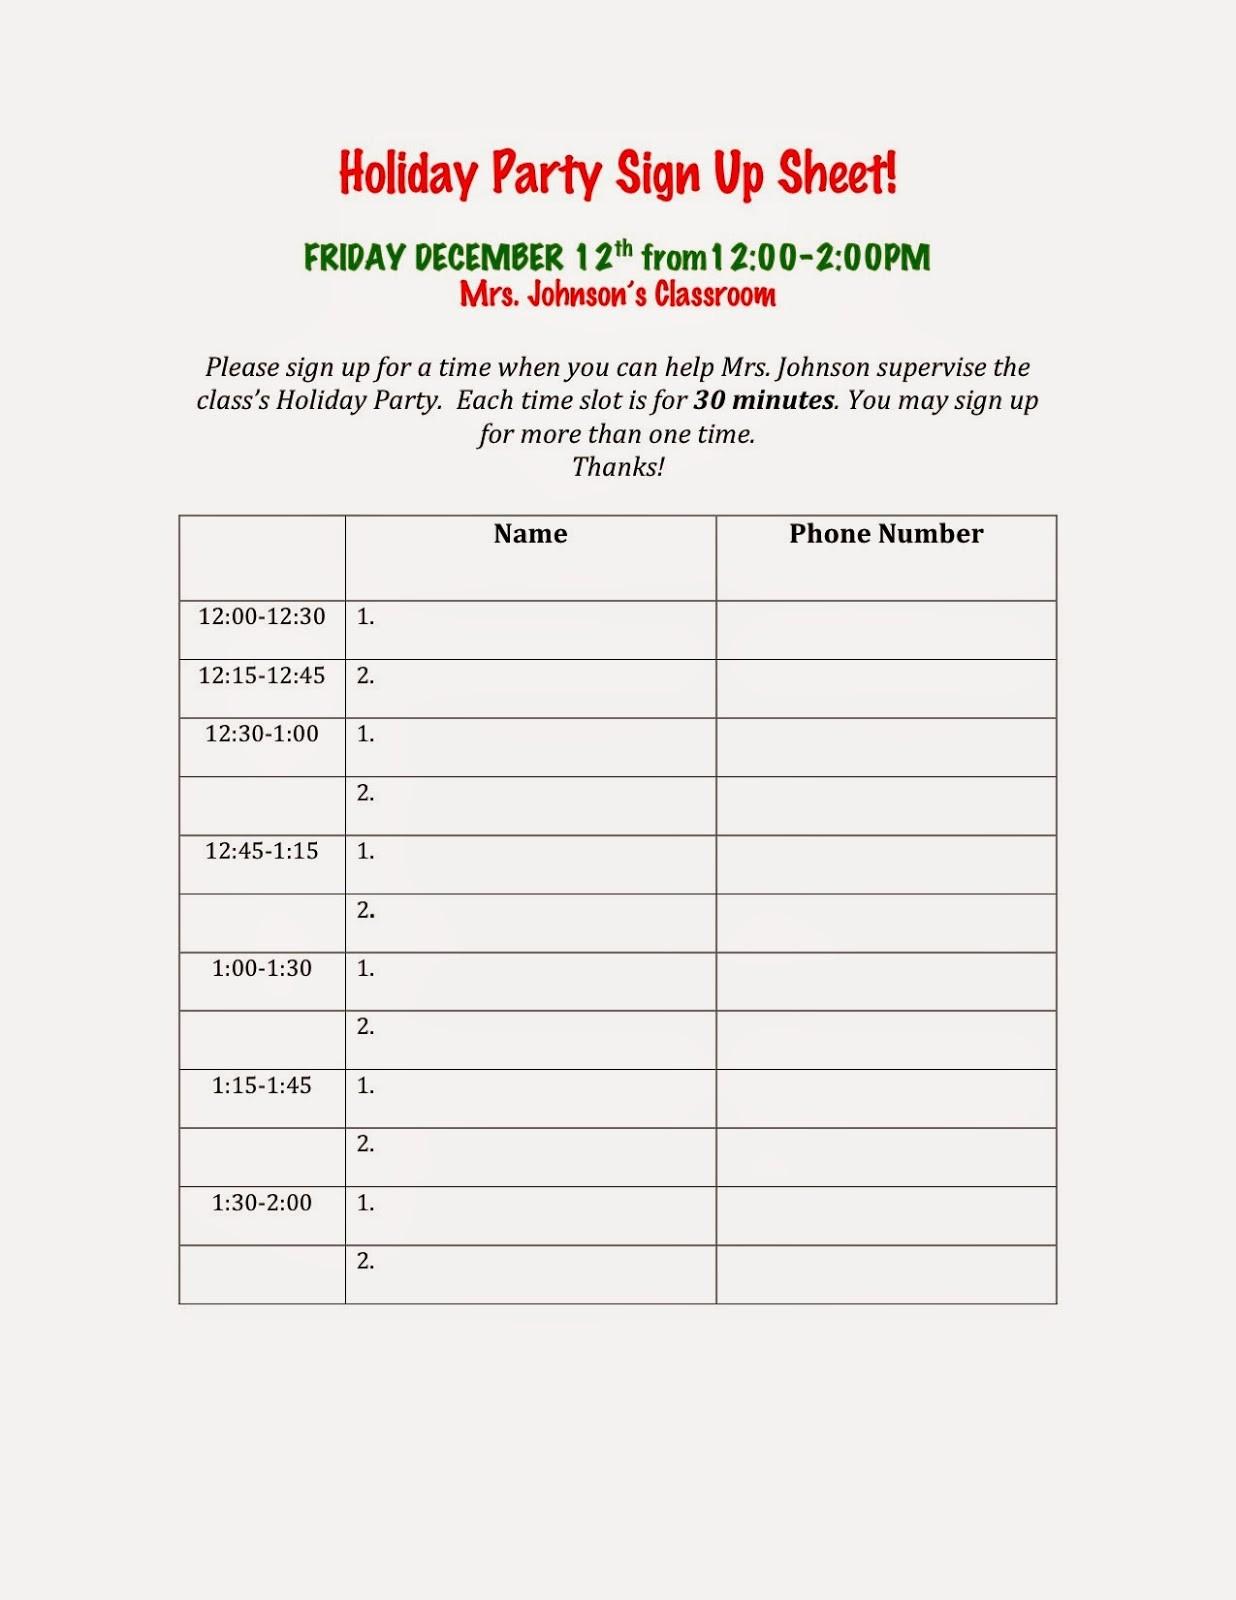 Holiday Sign Up Sheet Templates Beautiful Avenue B Holiday Party Sign Up Sheets